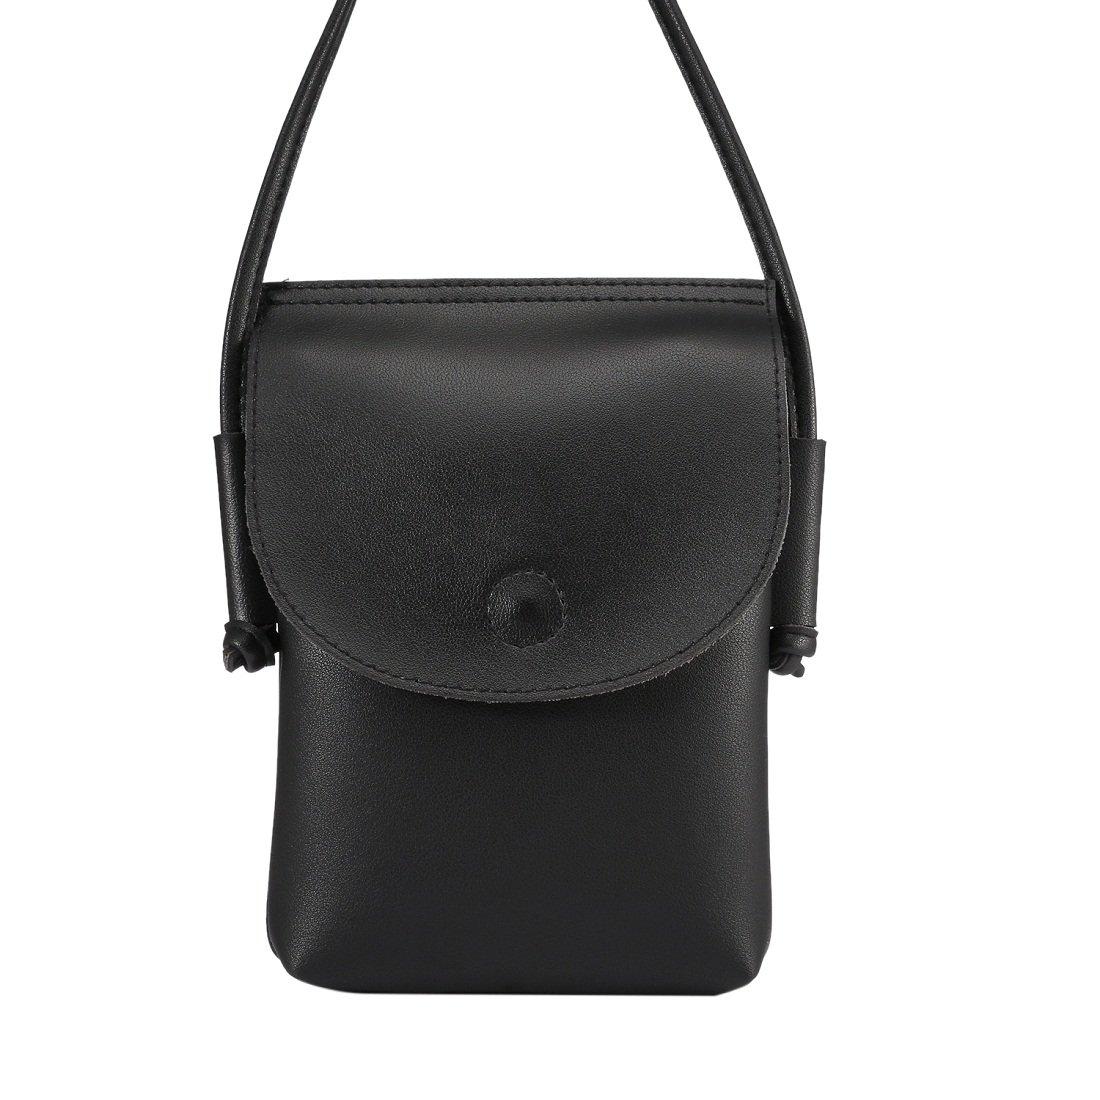 5b27a5ae7227 Crossbody Wallet Bag Cellphone Purse Pouch Bag Shoulder Crossbody Bag Girls  Mini Sling Pouch Wristlet Wallet Purse with Long Shoulder Strap Safe Lock  Button ...